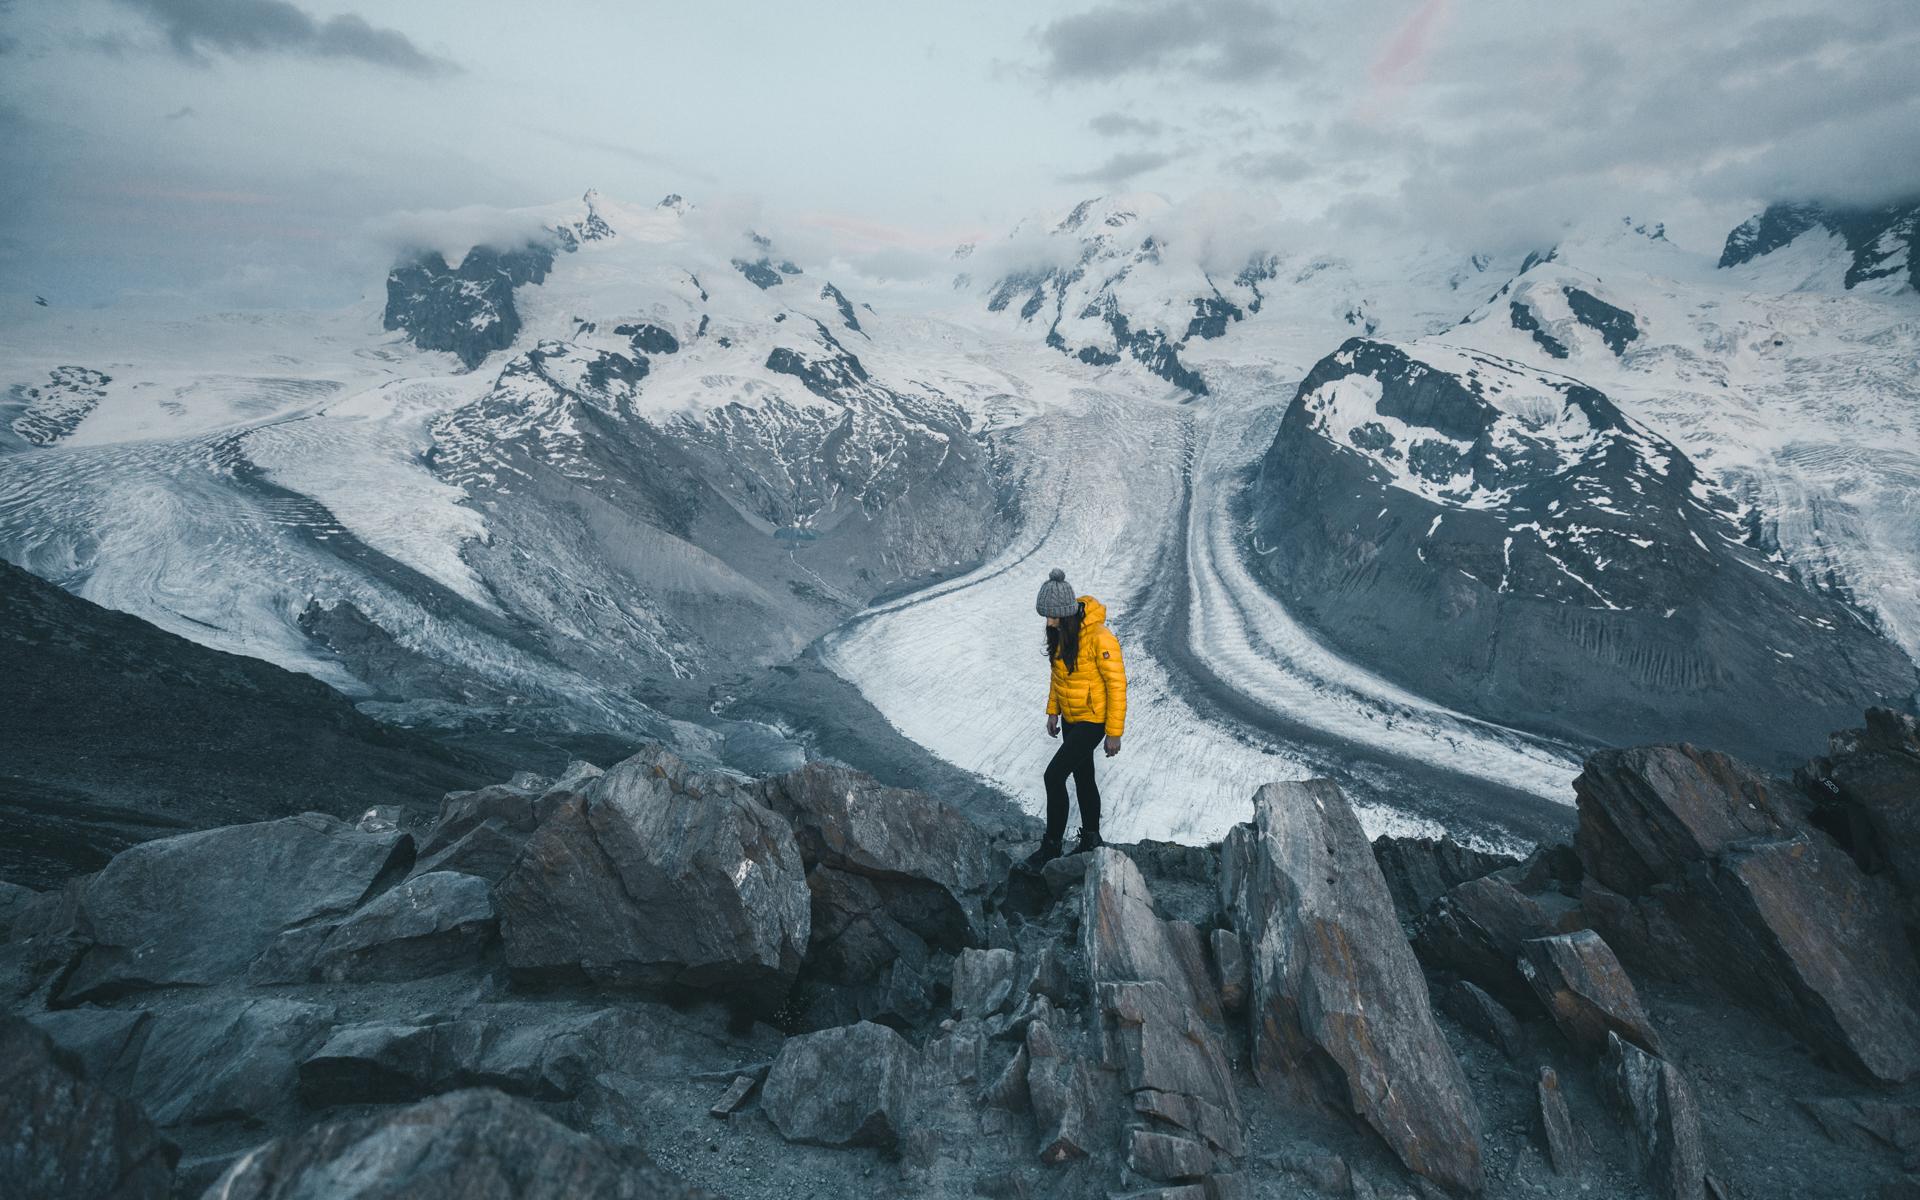 Alina_Kondrat_Travel_Landscape_Alps-3.jpg